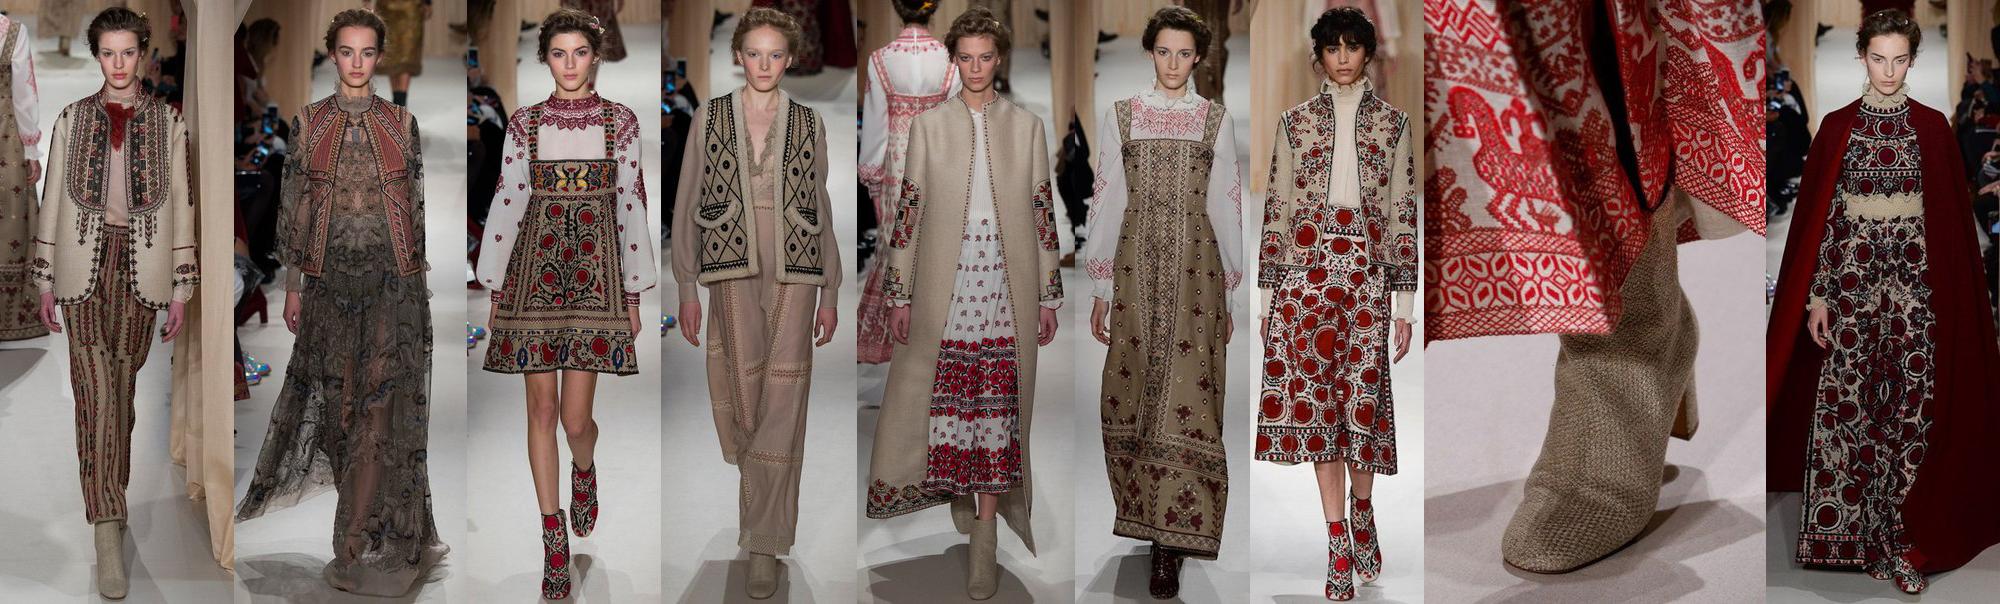 Мода на русское фото